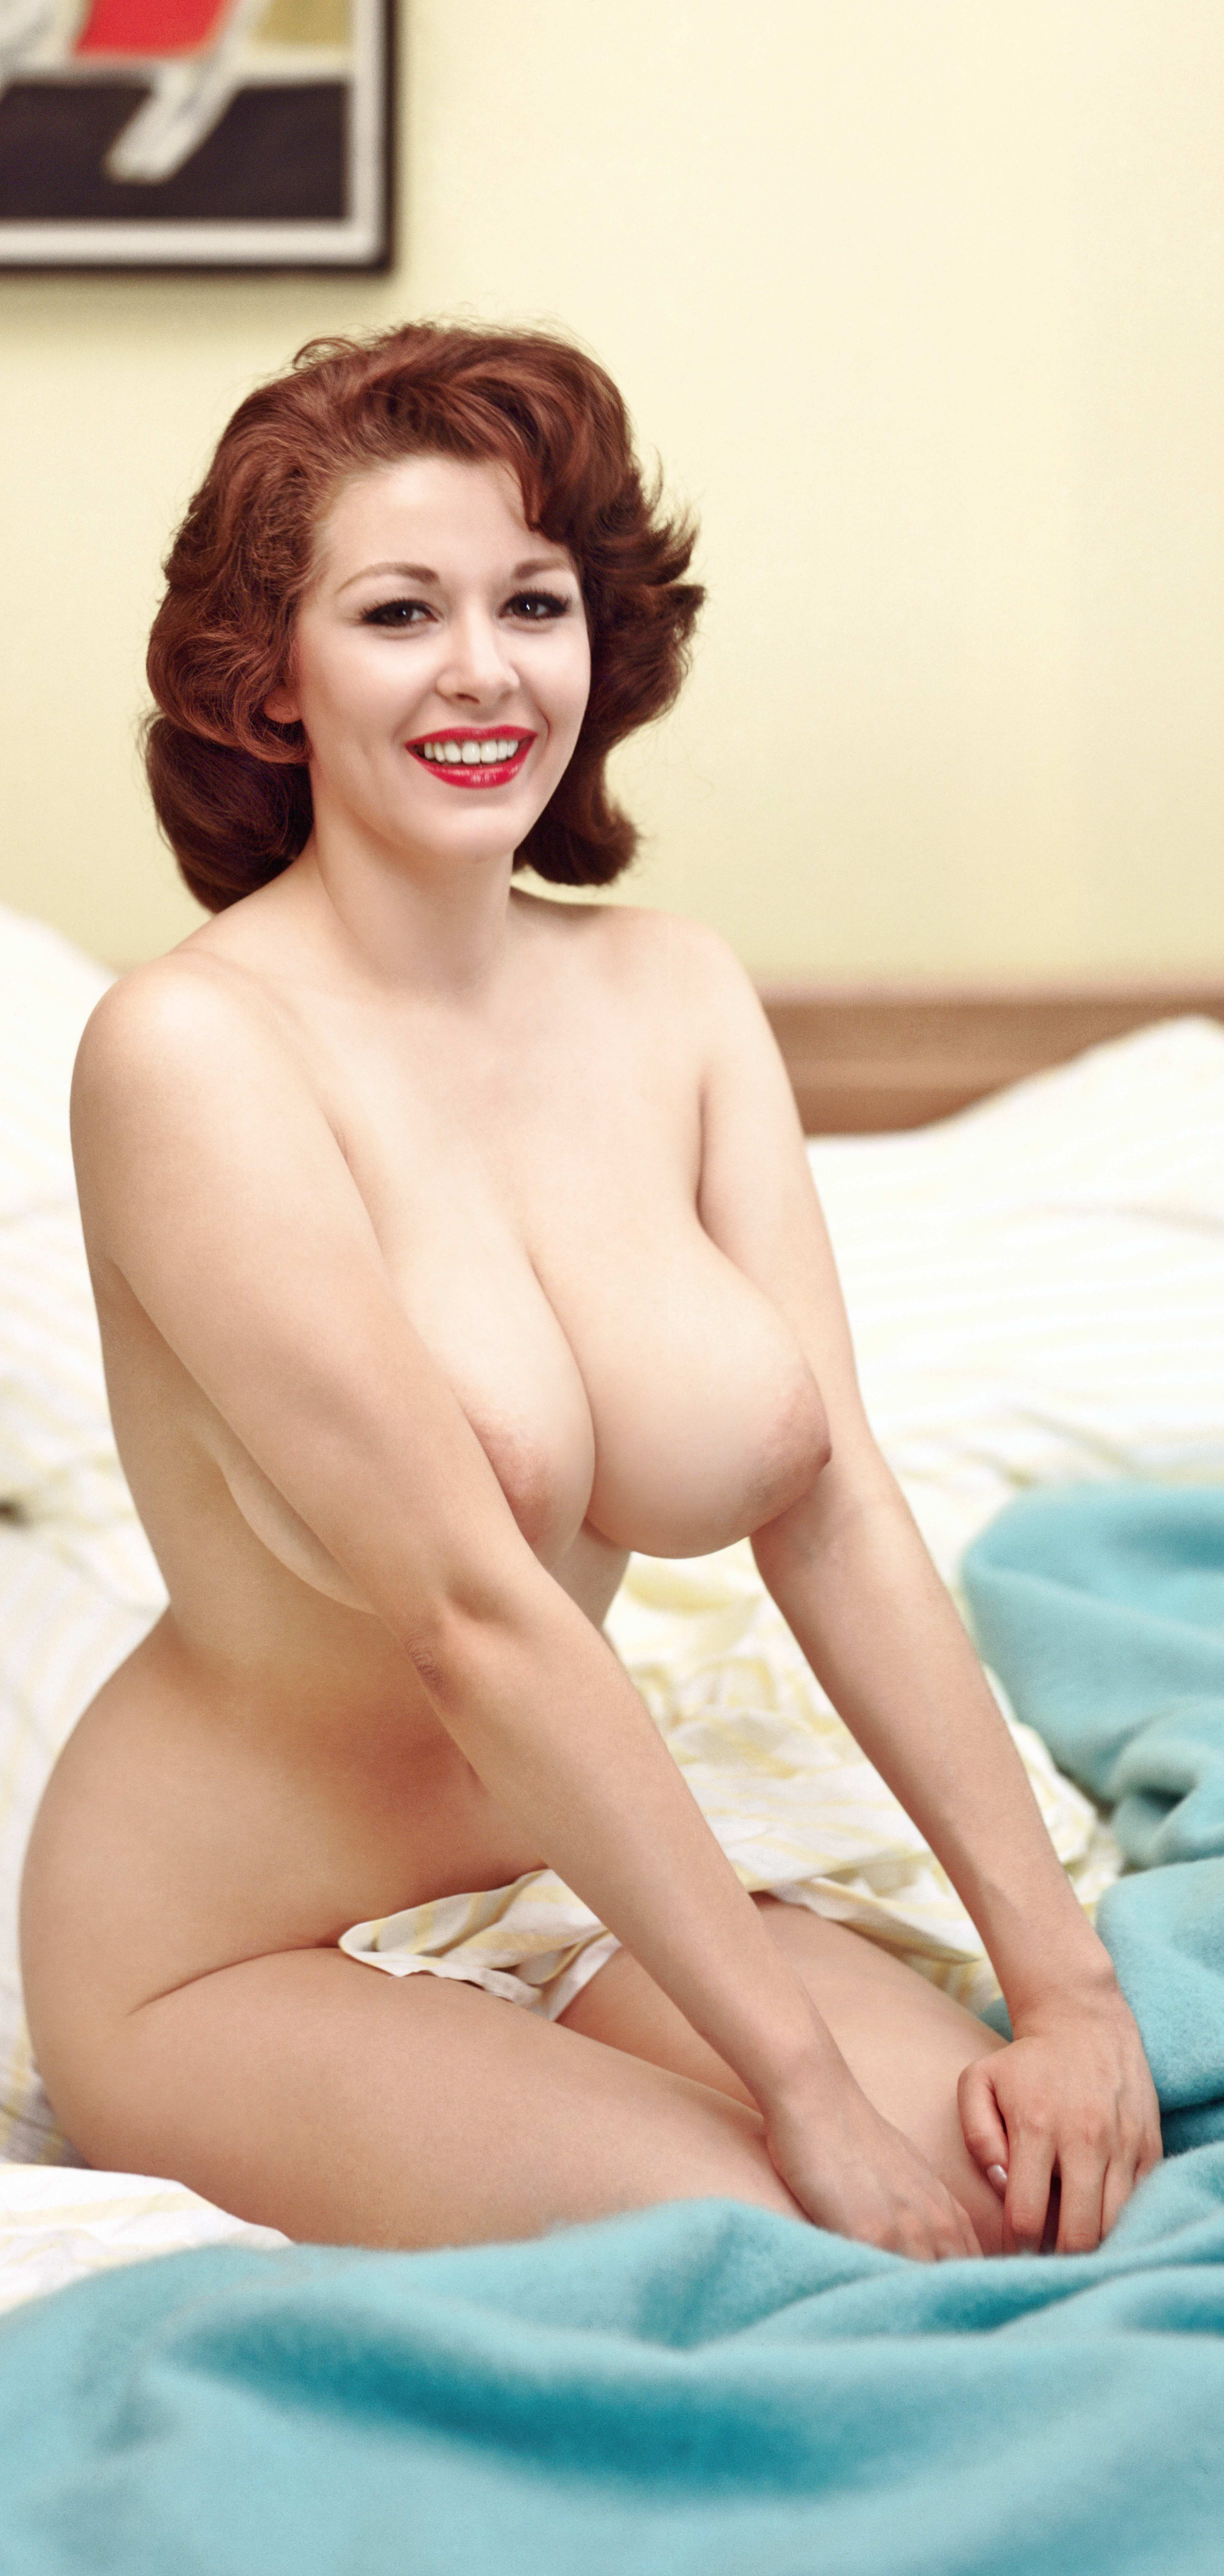 Ruth reynolds naked pics